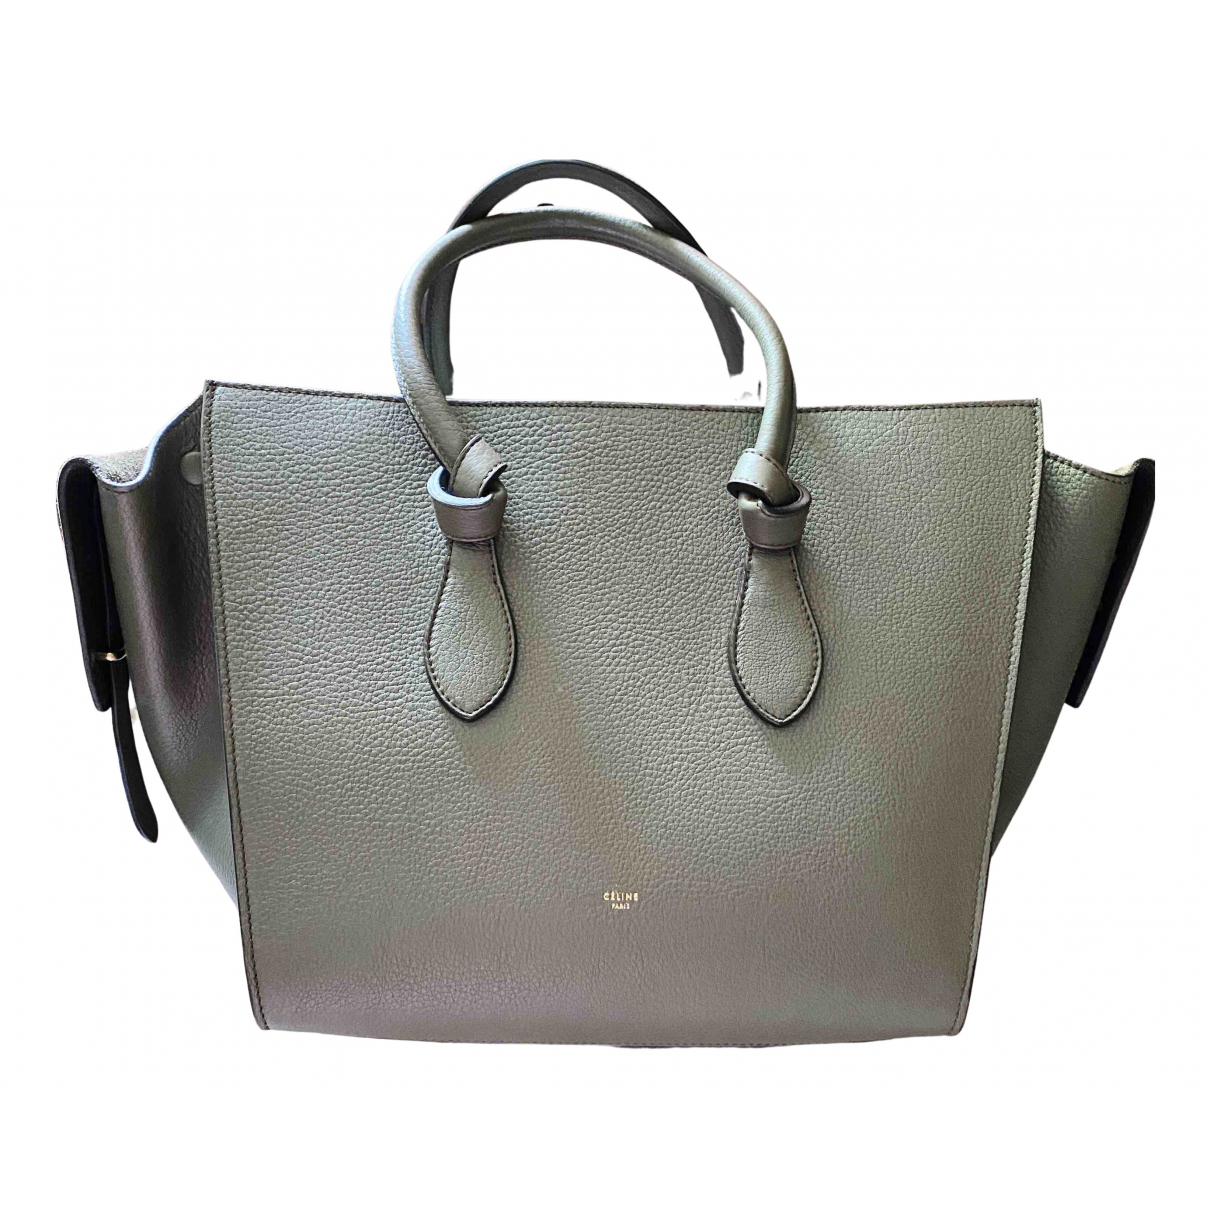 Celine Tie Handtasche in  Grau Leder